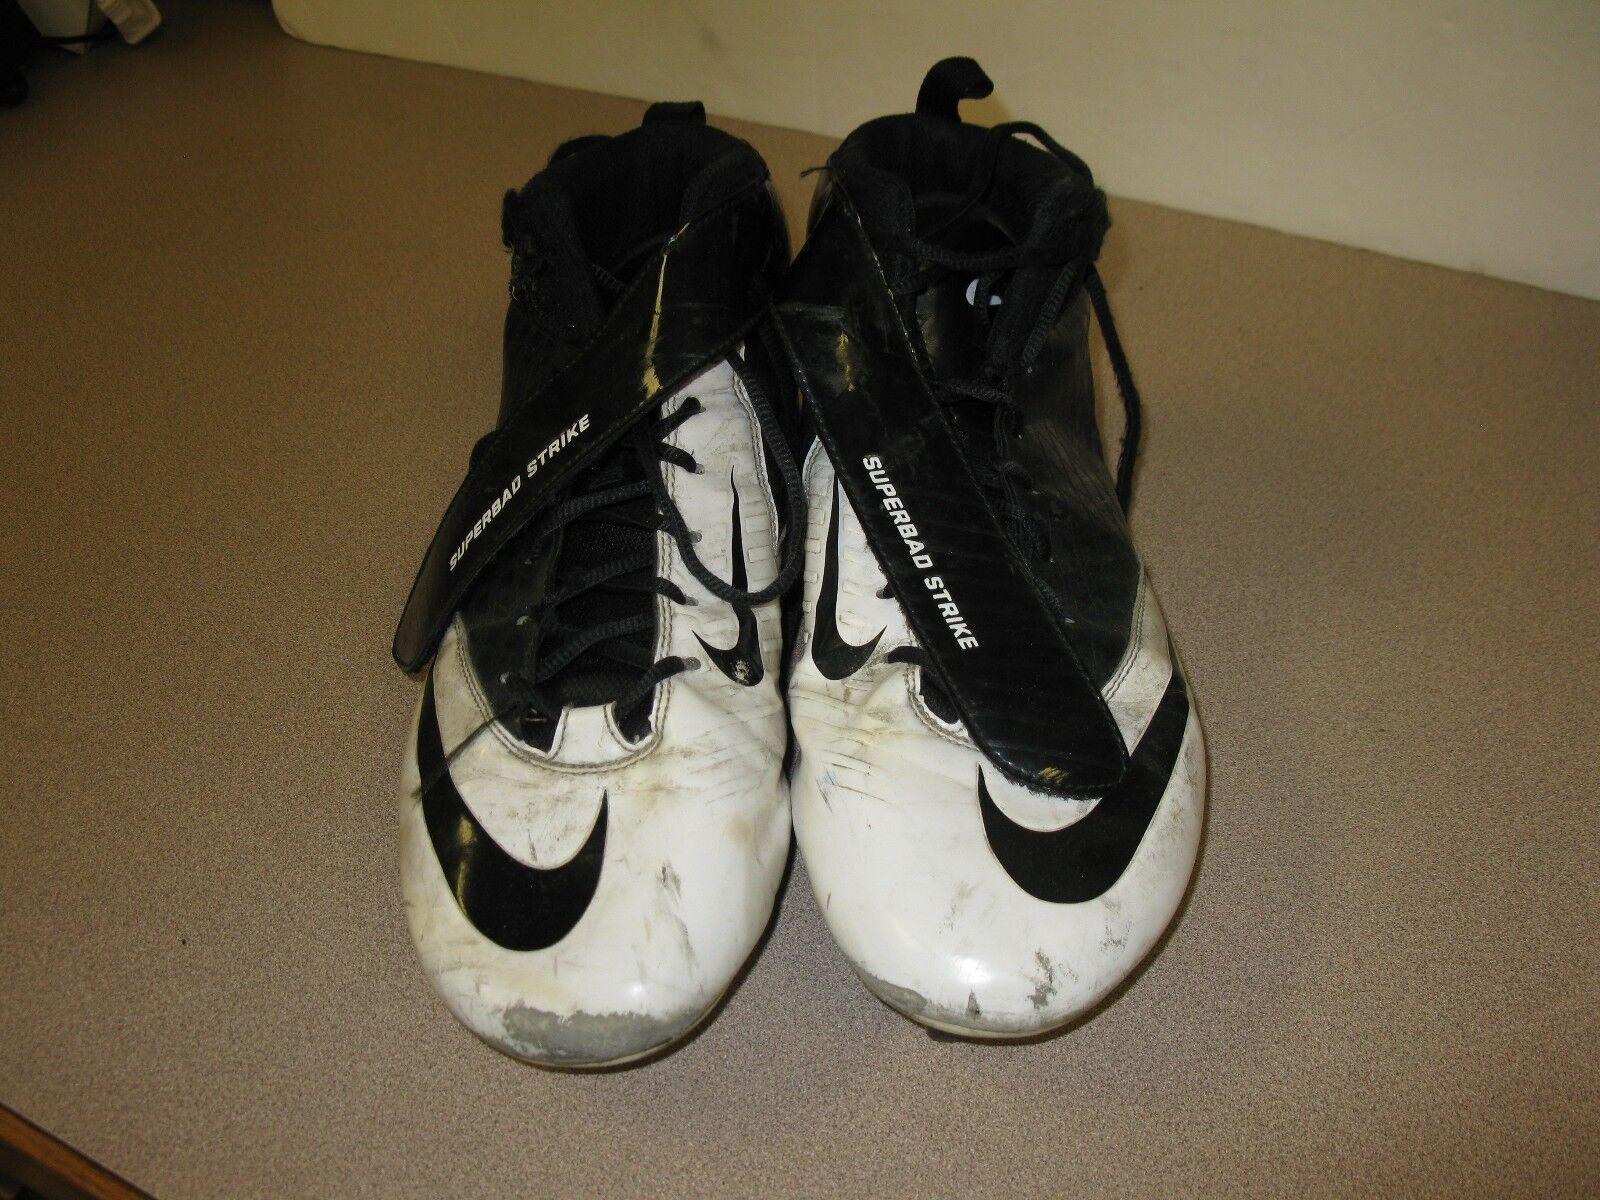 6540798e36a Nike Super Bad Strike Strike Strike D Football Cleats Size 11.5 White Black  Leather Shoes e60347